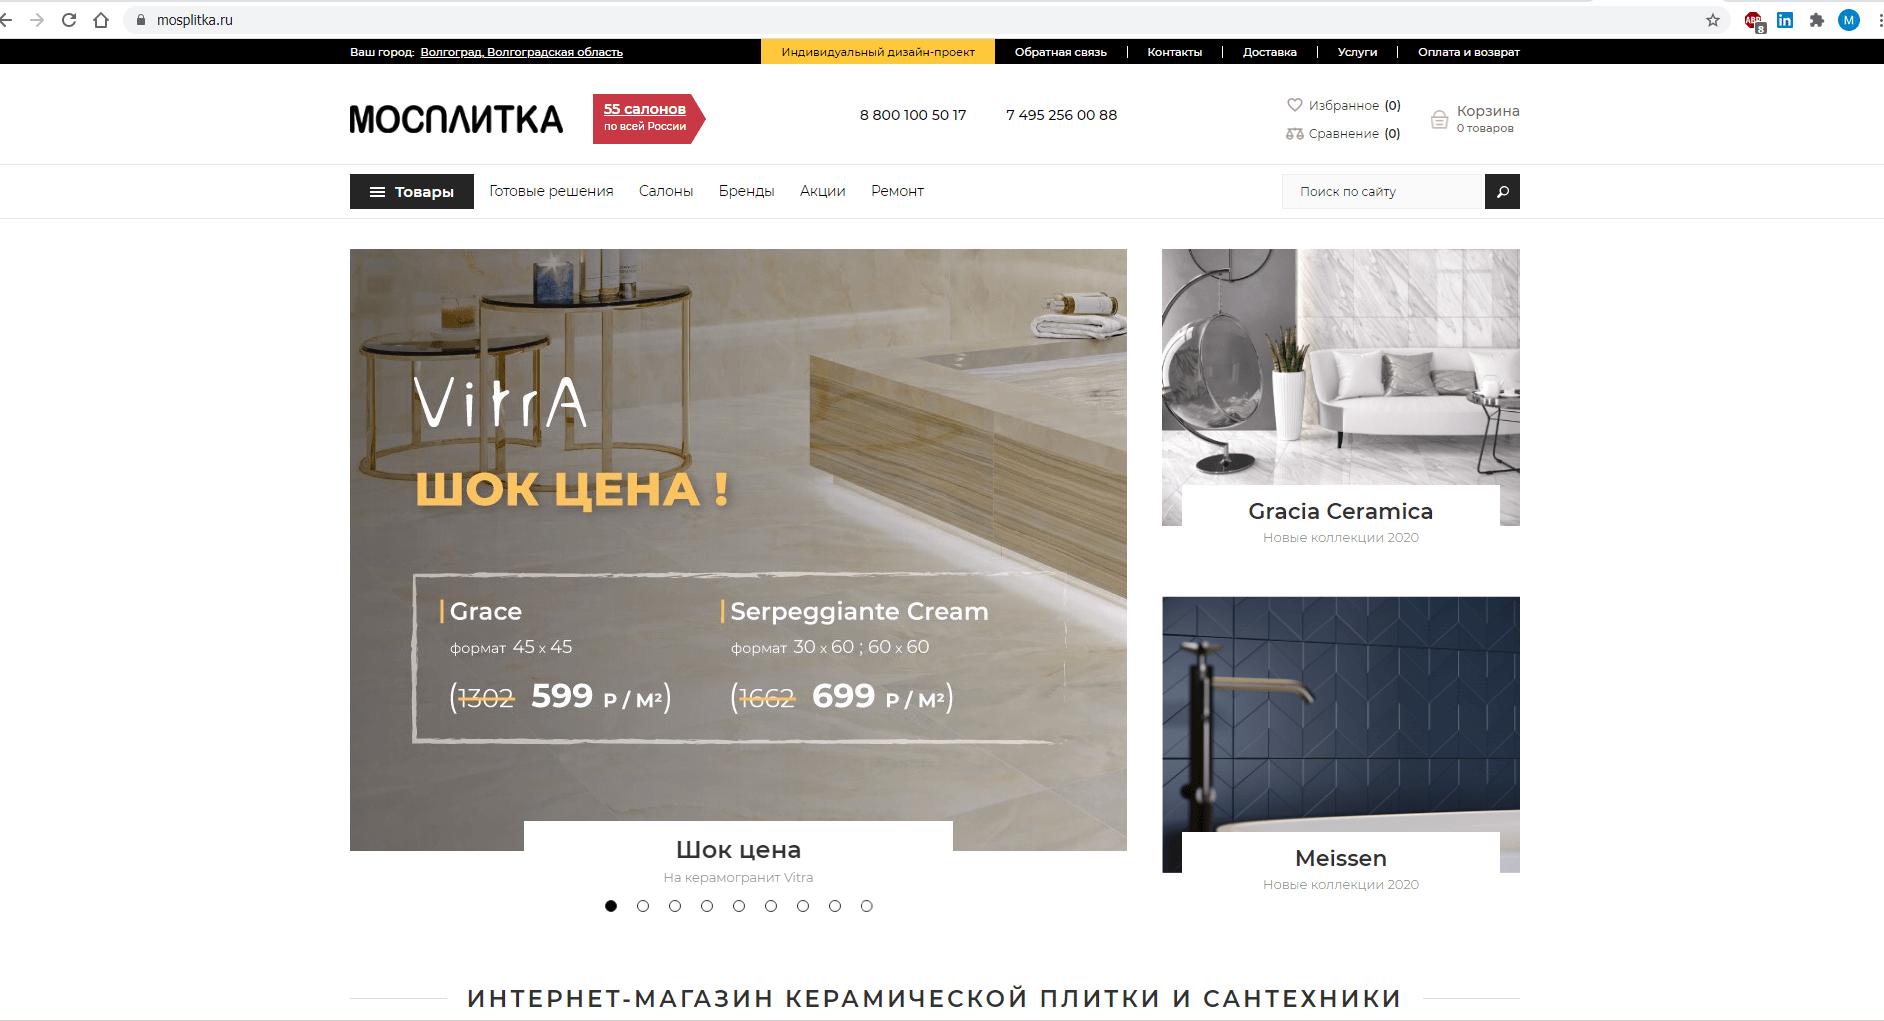 mosplitka.ru website